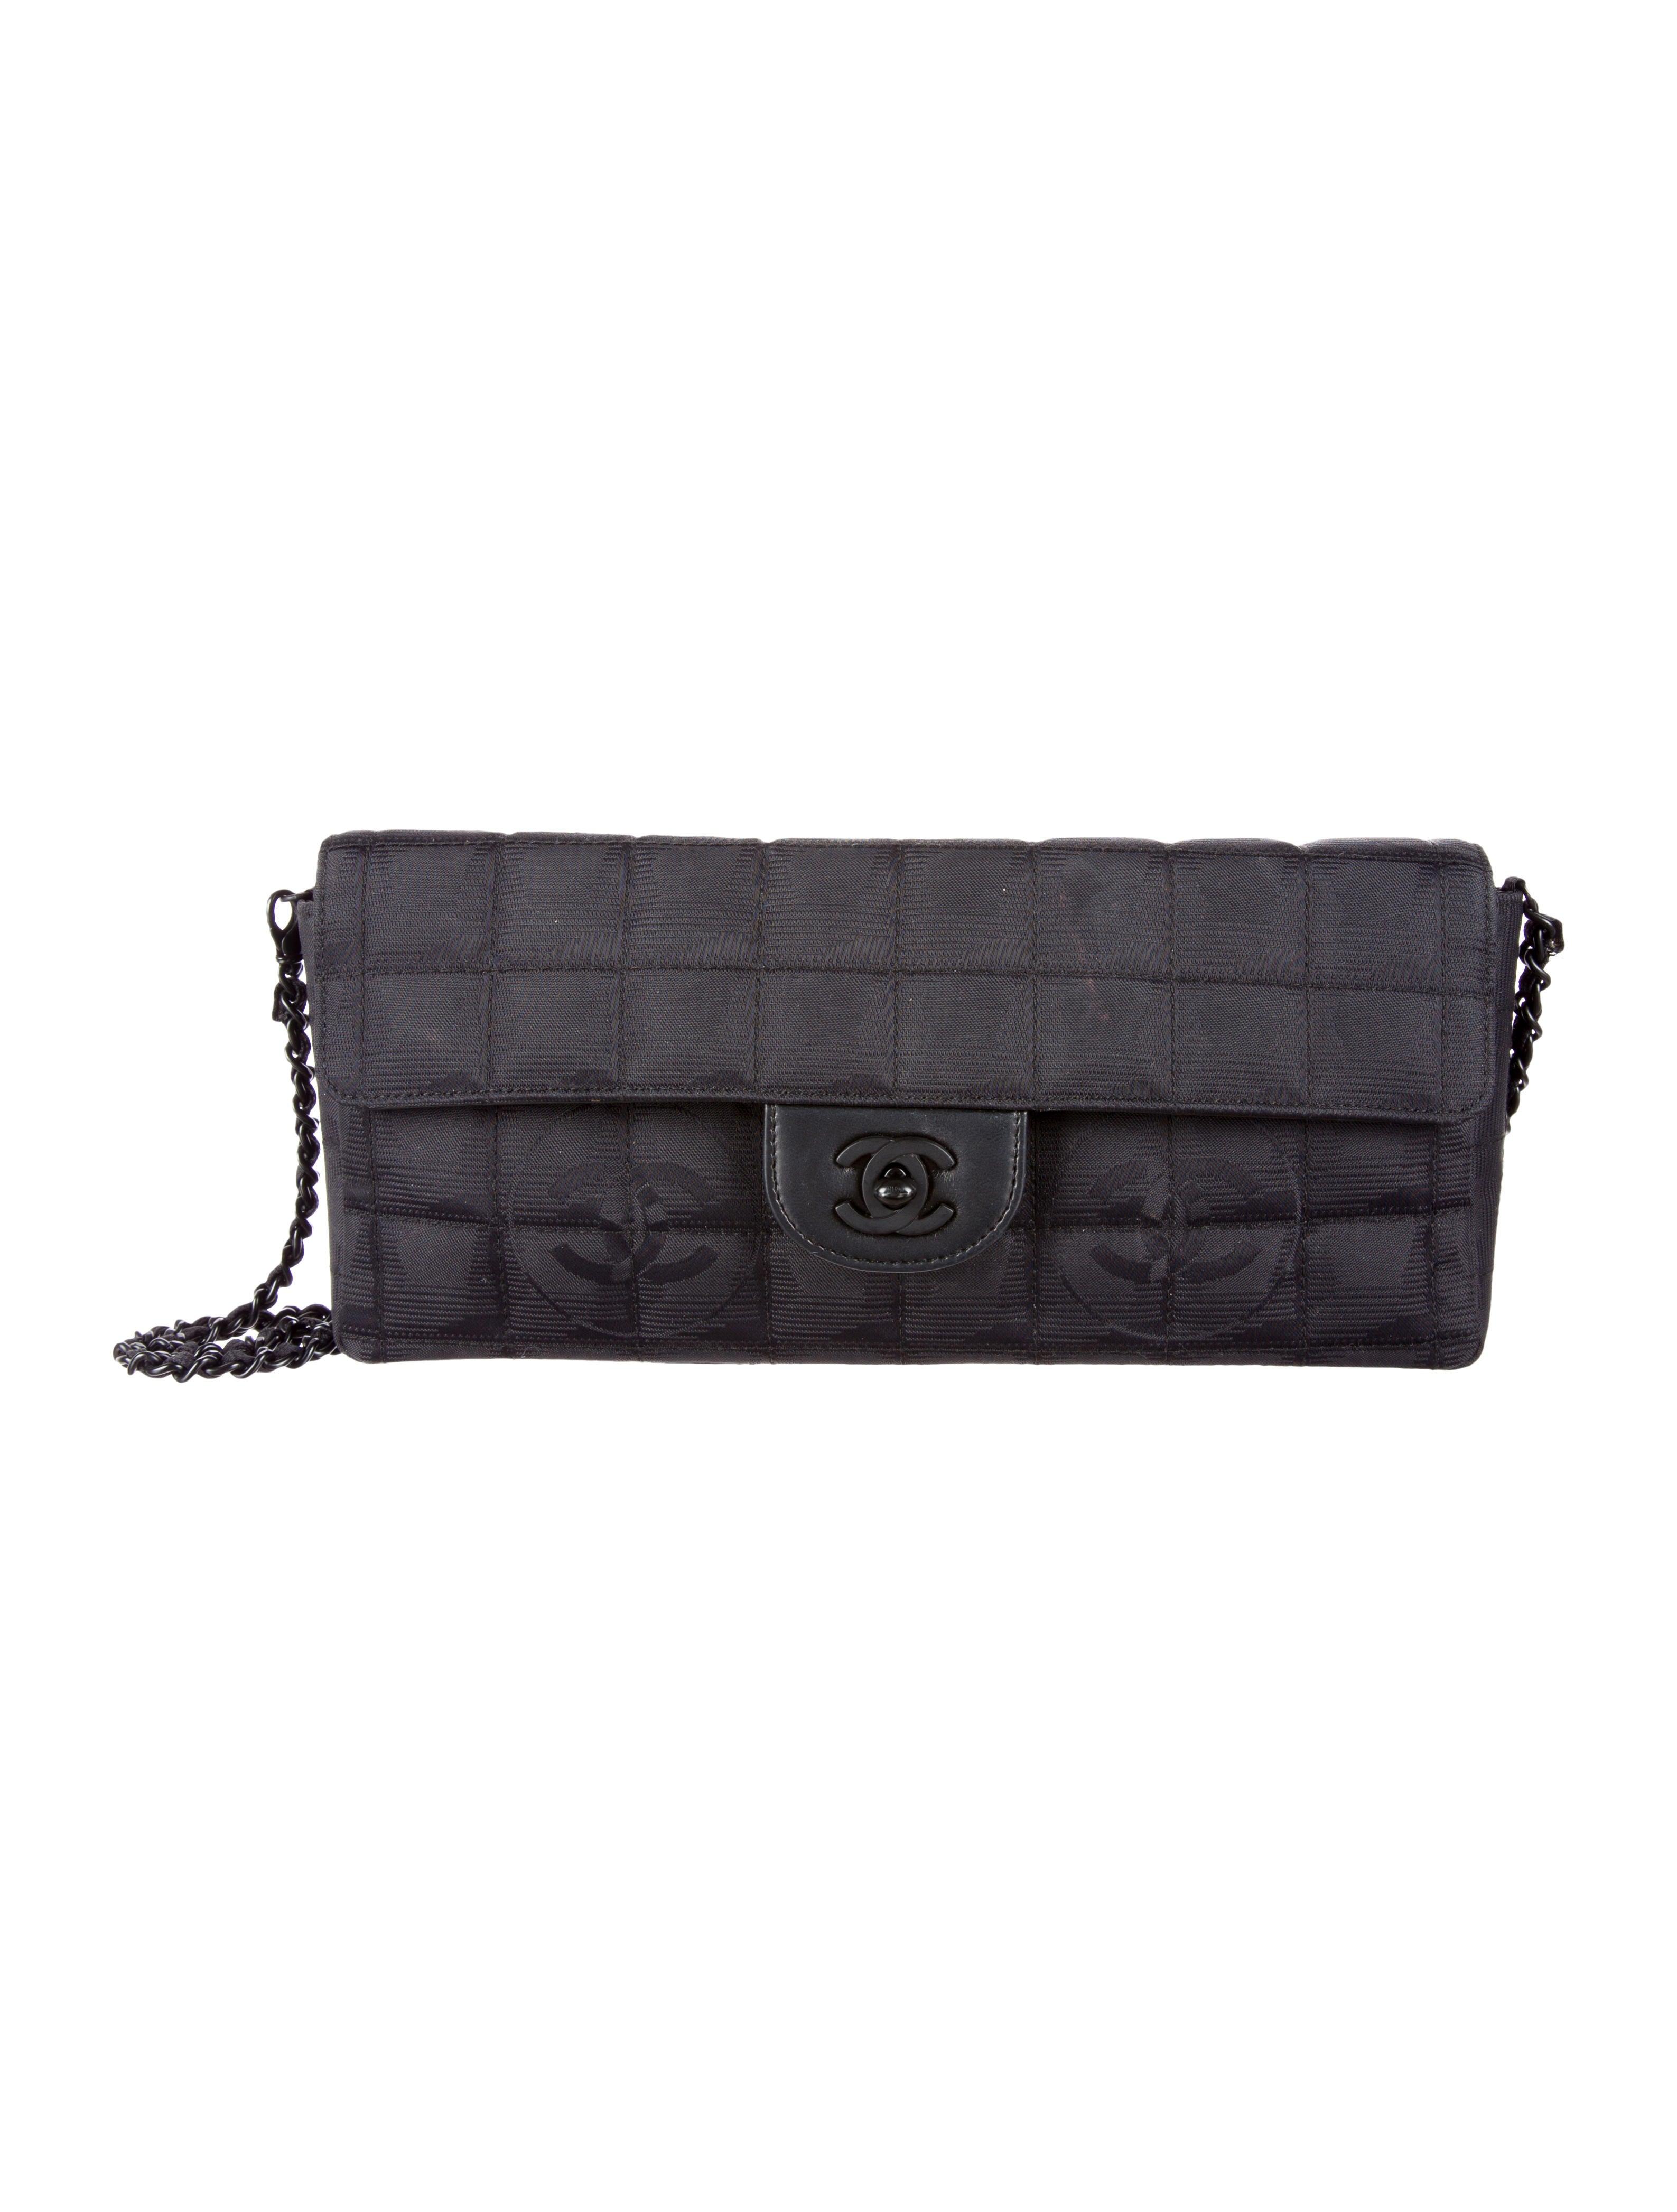 49212c0f5c5f Chanel Travel Line Flap Bag - Handbags - CHA75834 | The RealReal